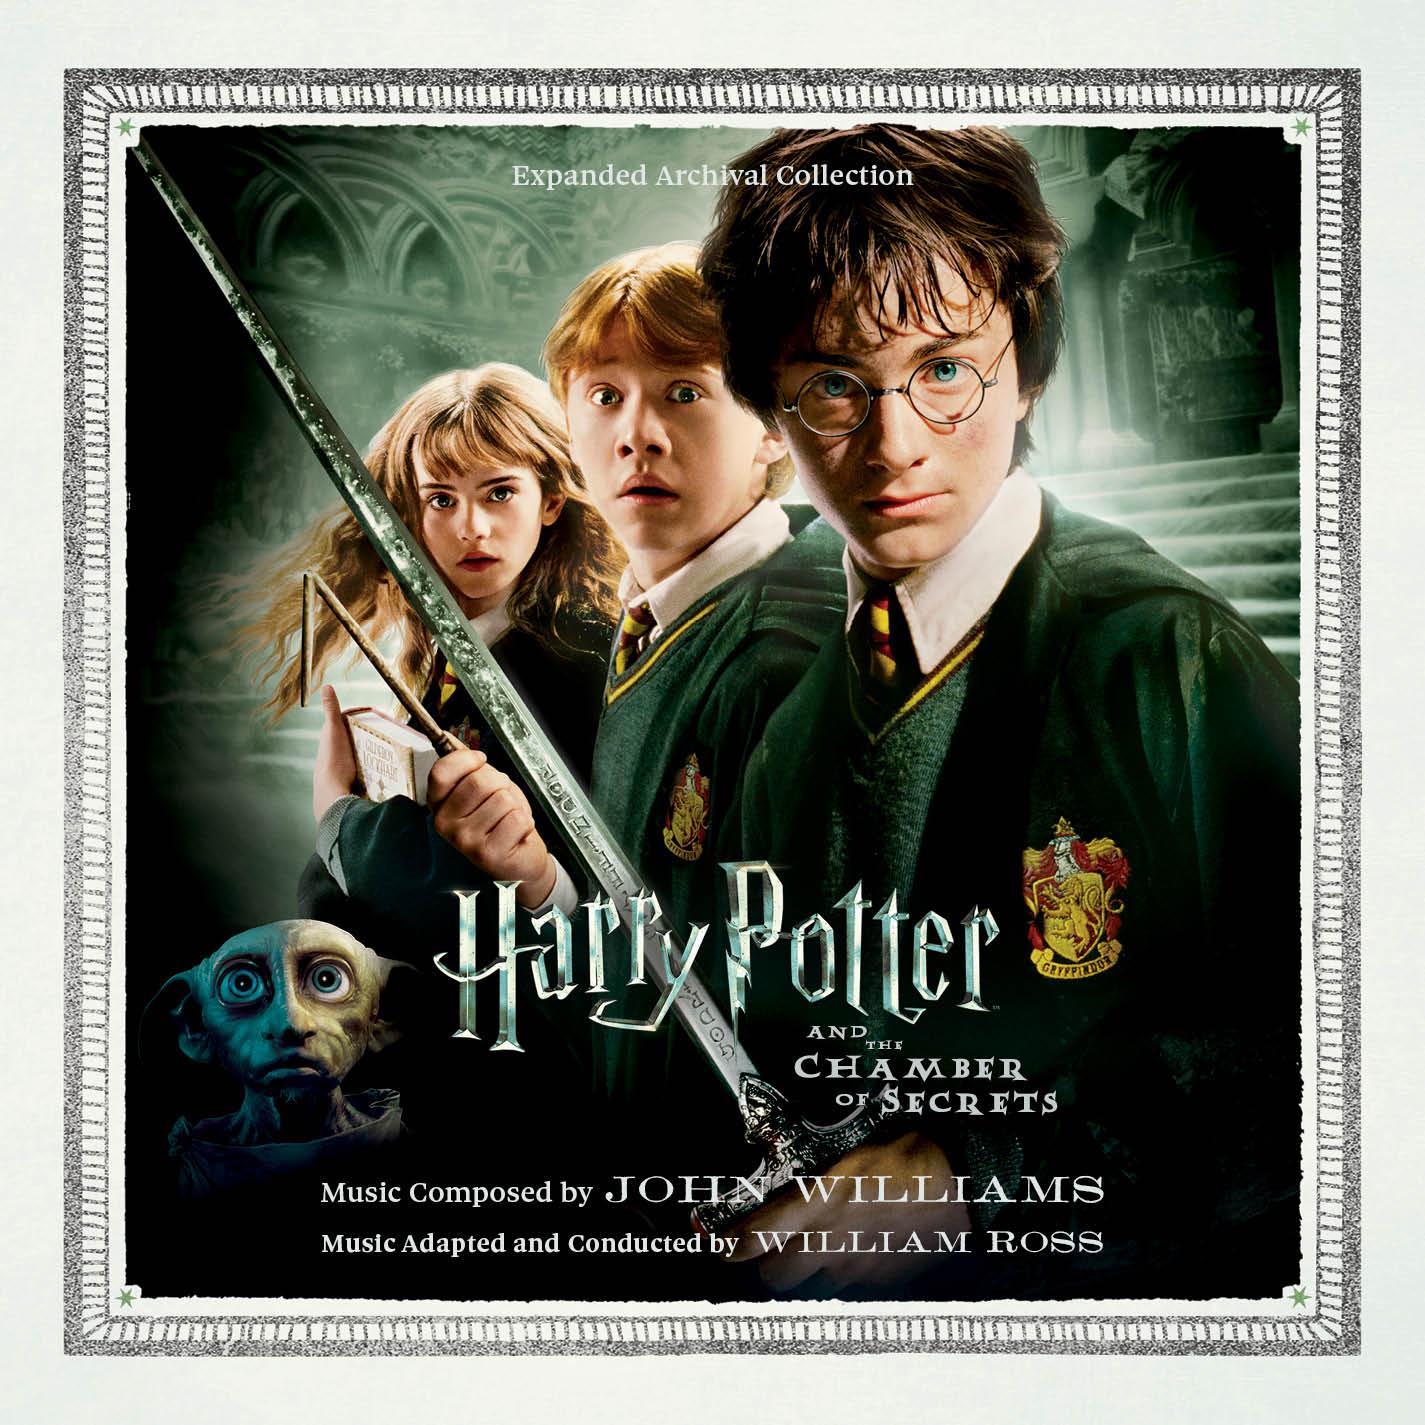 Potterish.com [Year 18] :: Harry Potter, The Ickabog, Fantastic Beasts, JK Rowling, Daniel, Emma & Rupert Harry Potter soundtracks will get unpublished tracks